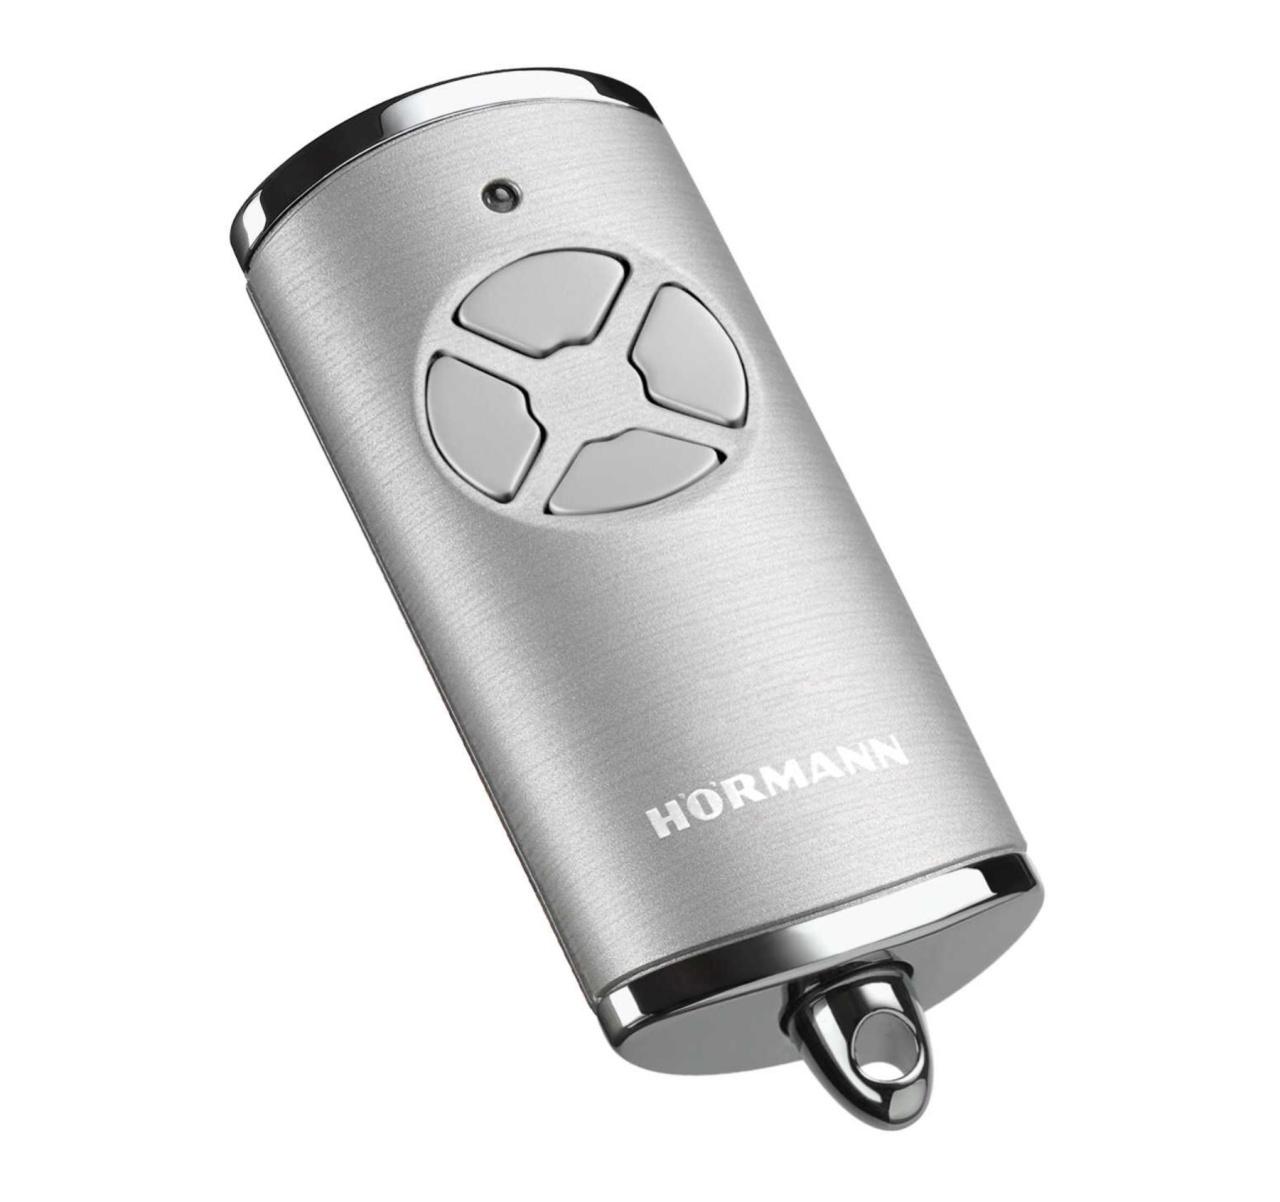 Handsender Hörmann HSE4 BS mit BiSecur Chrom Silber